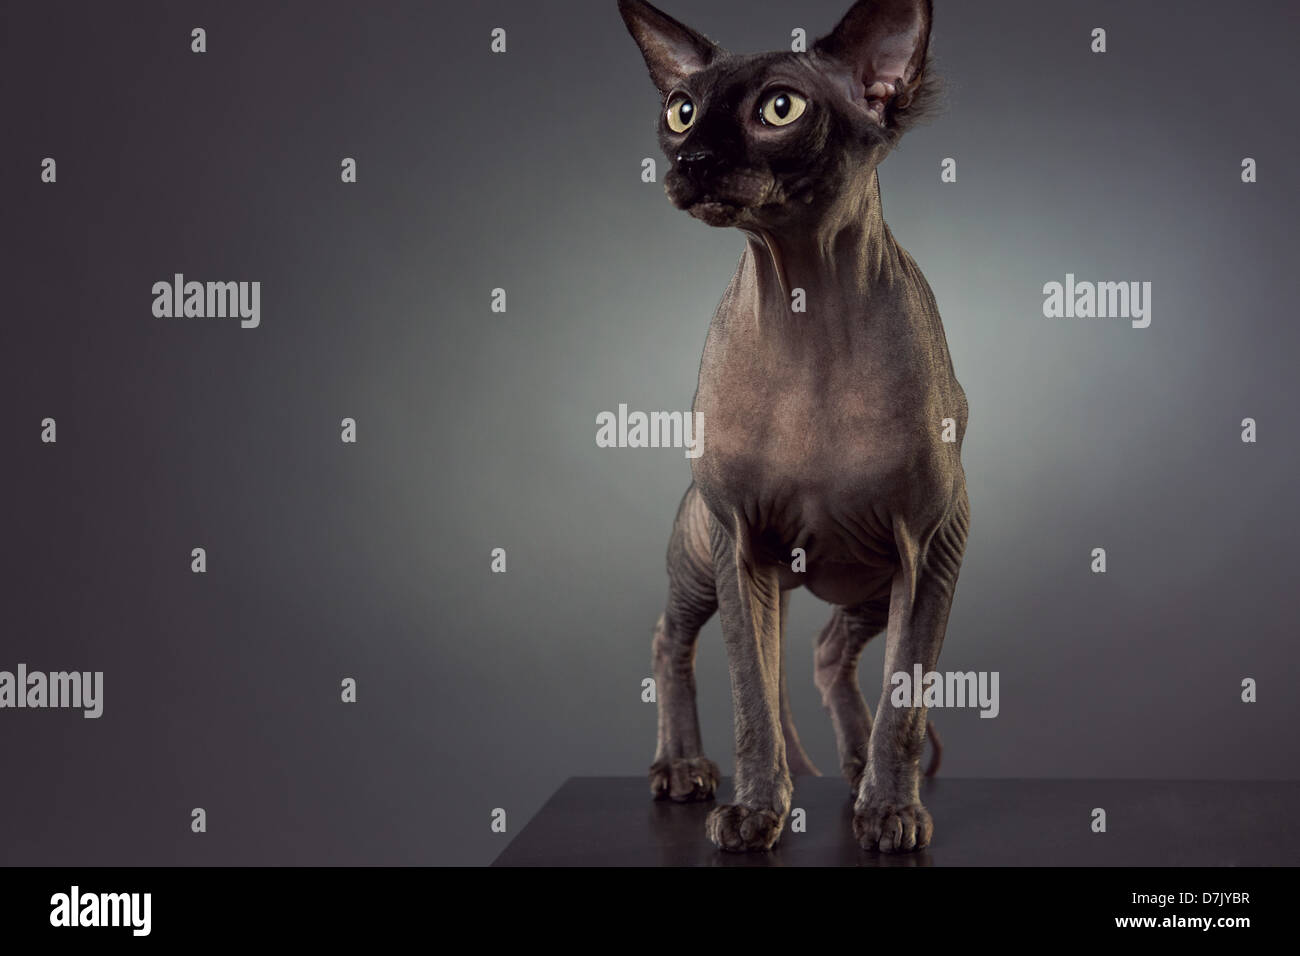 Portrait of hairless Sphinx cat in studio - Stock Image